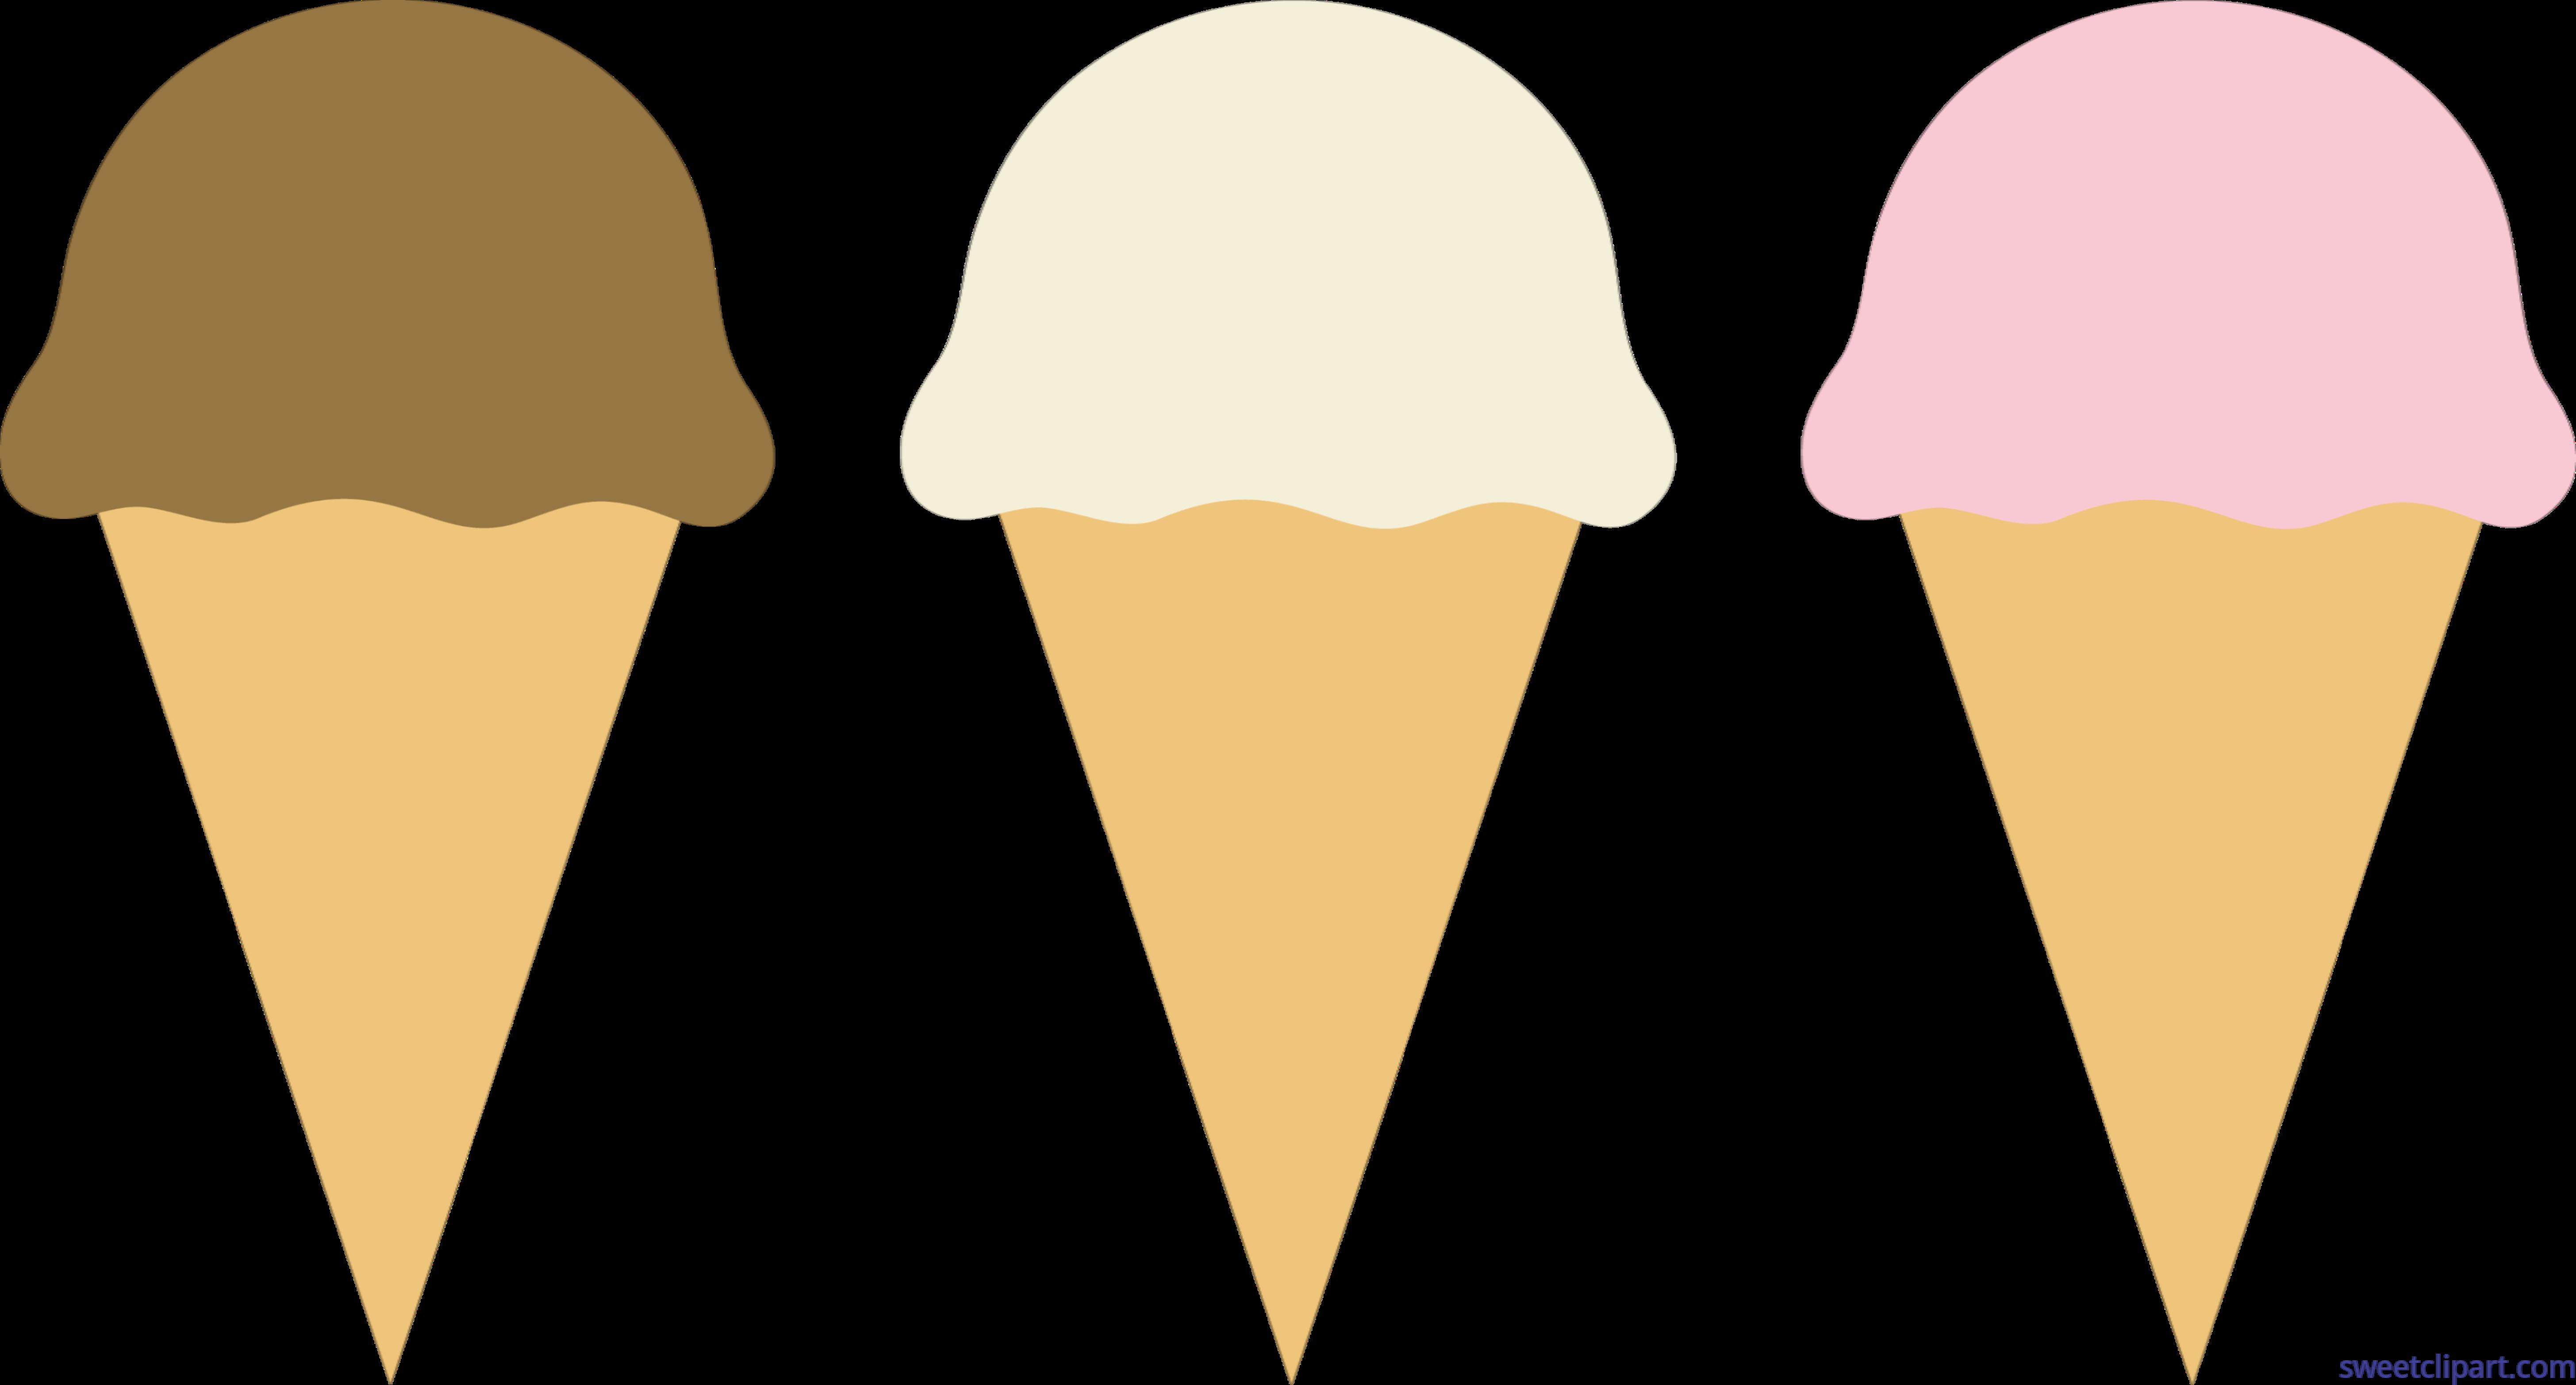 Icecream clipart candy. Ice cream cones chocolate